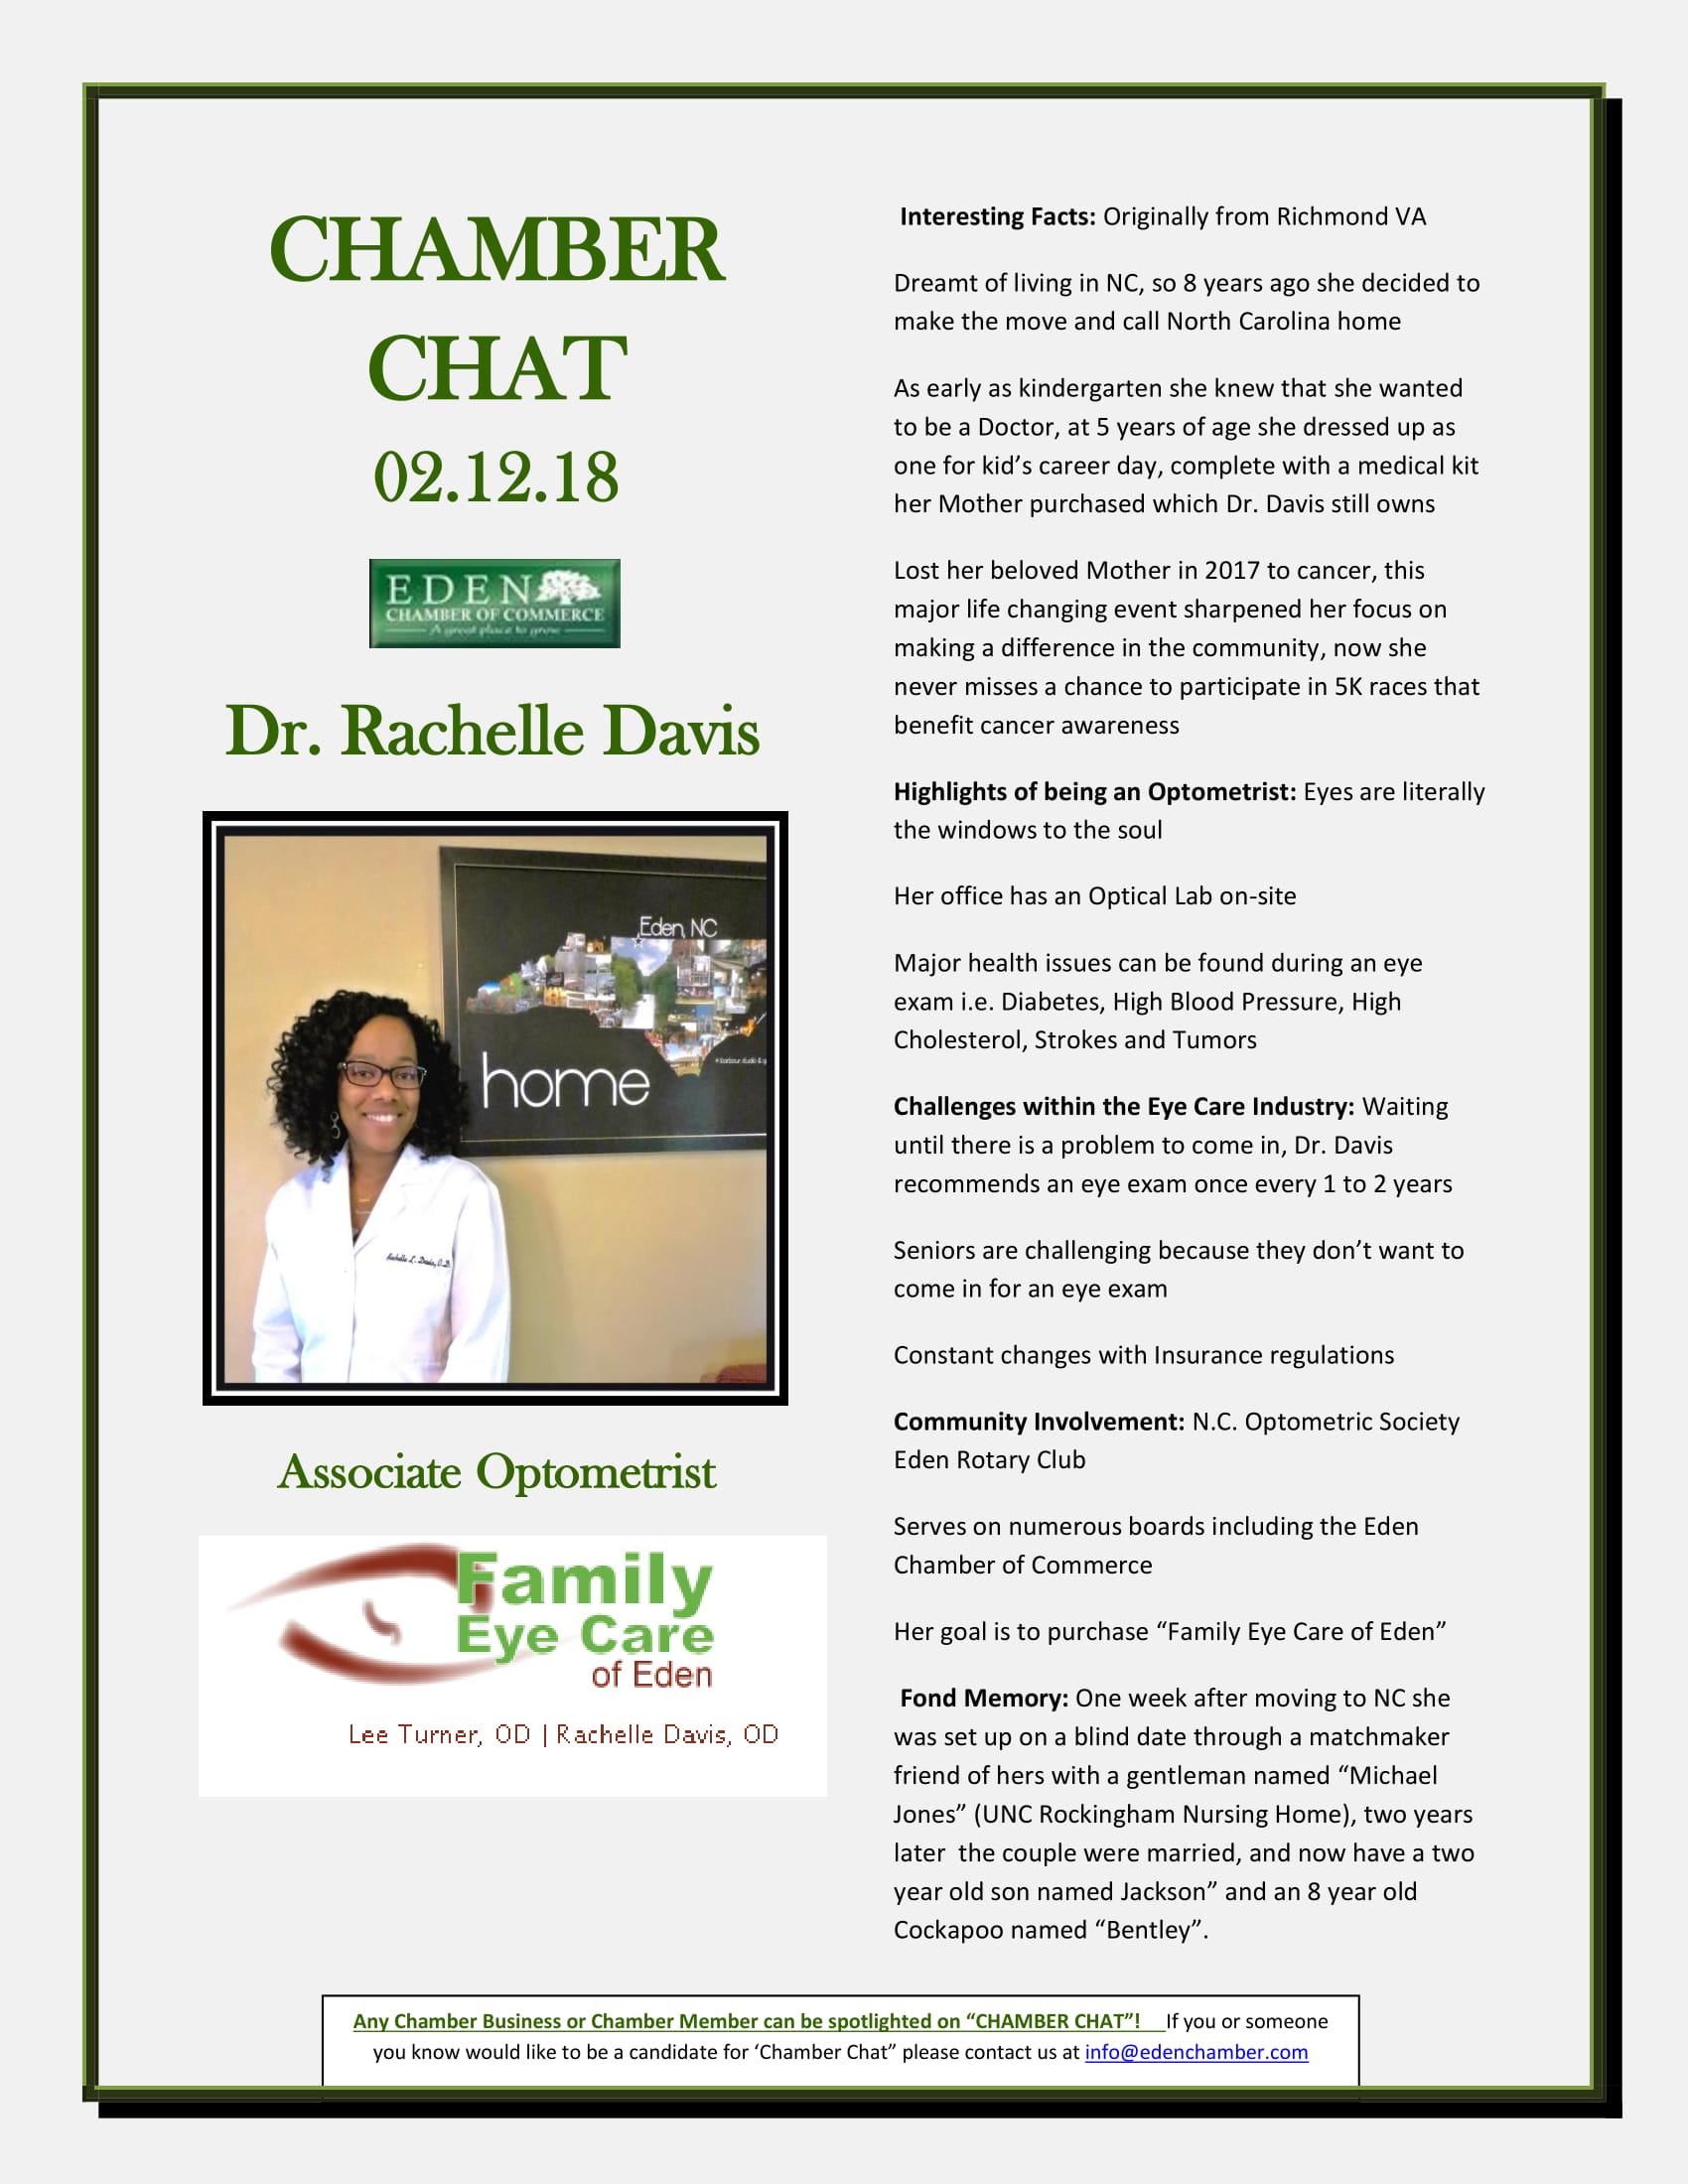 CHAMBER-CHAT-Dr.-Rachelle-Davis-02.12.18-1(1)